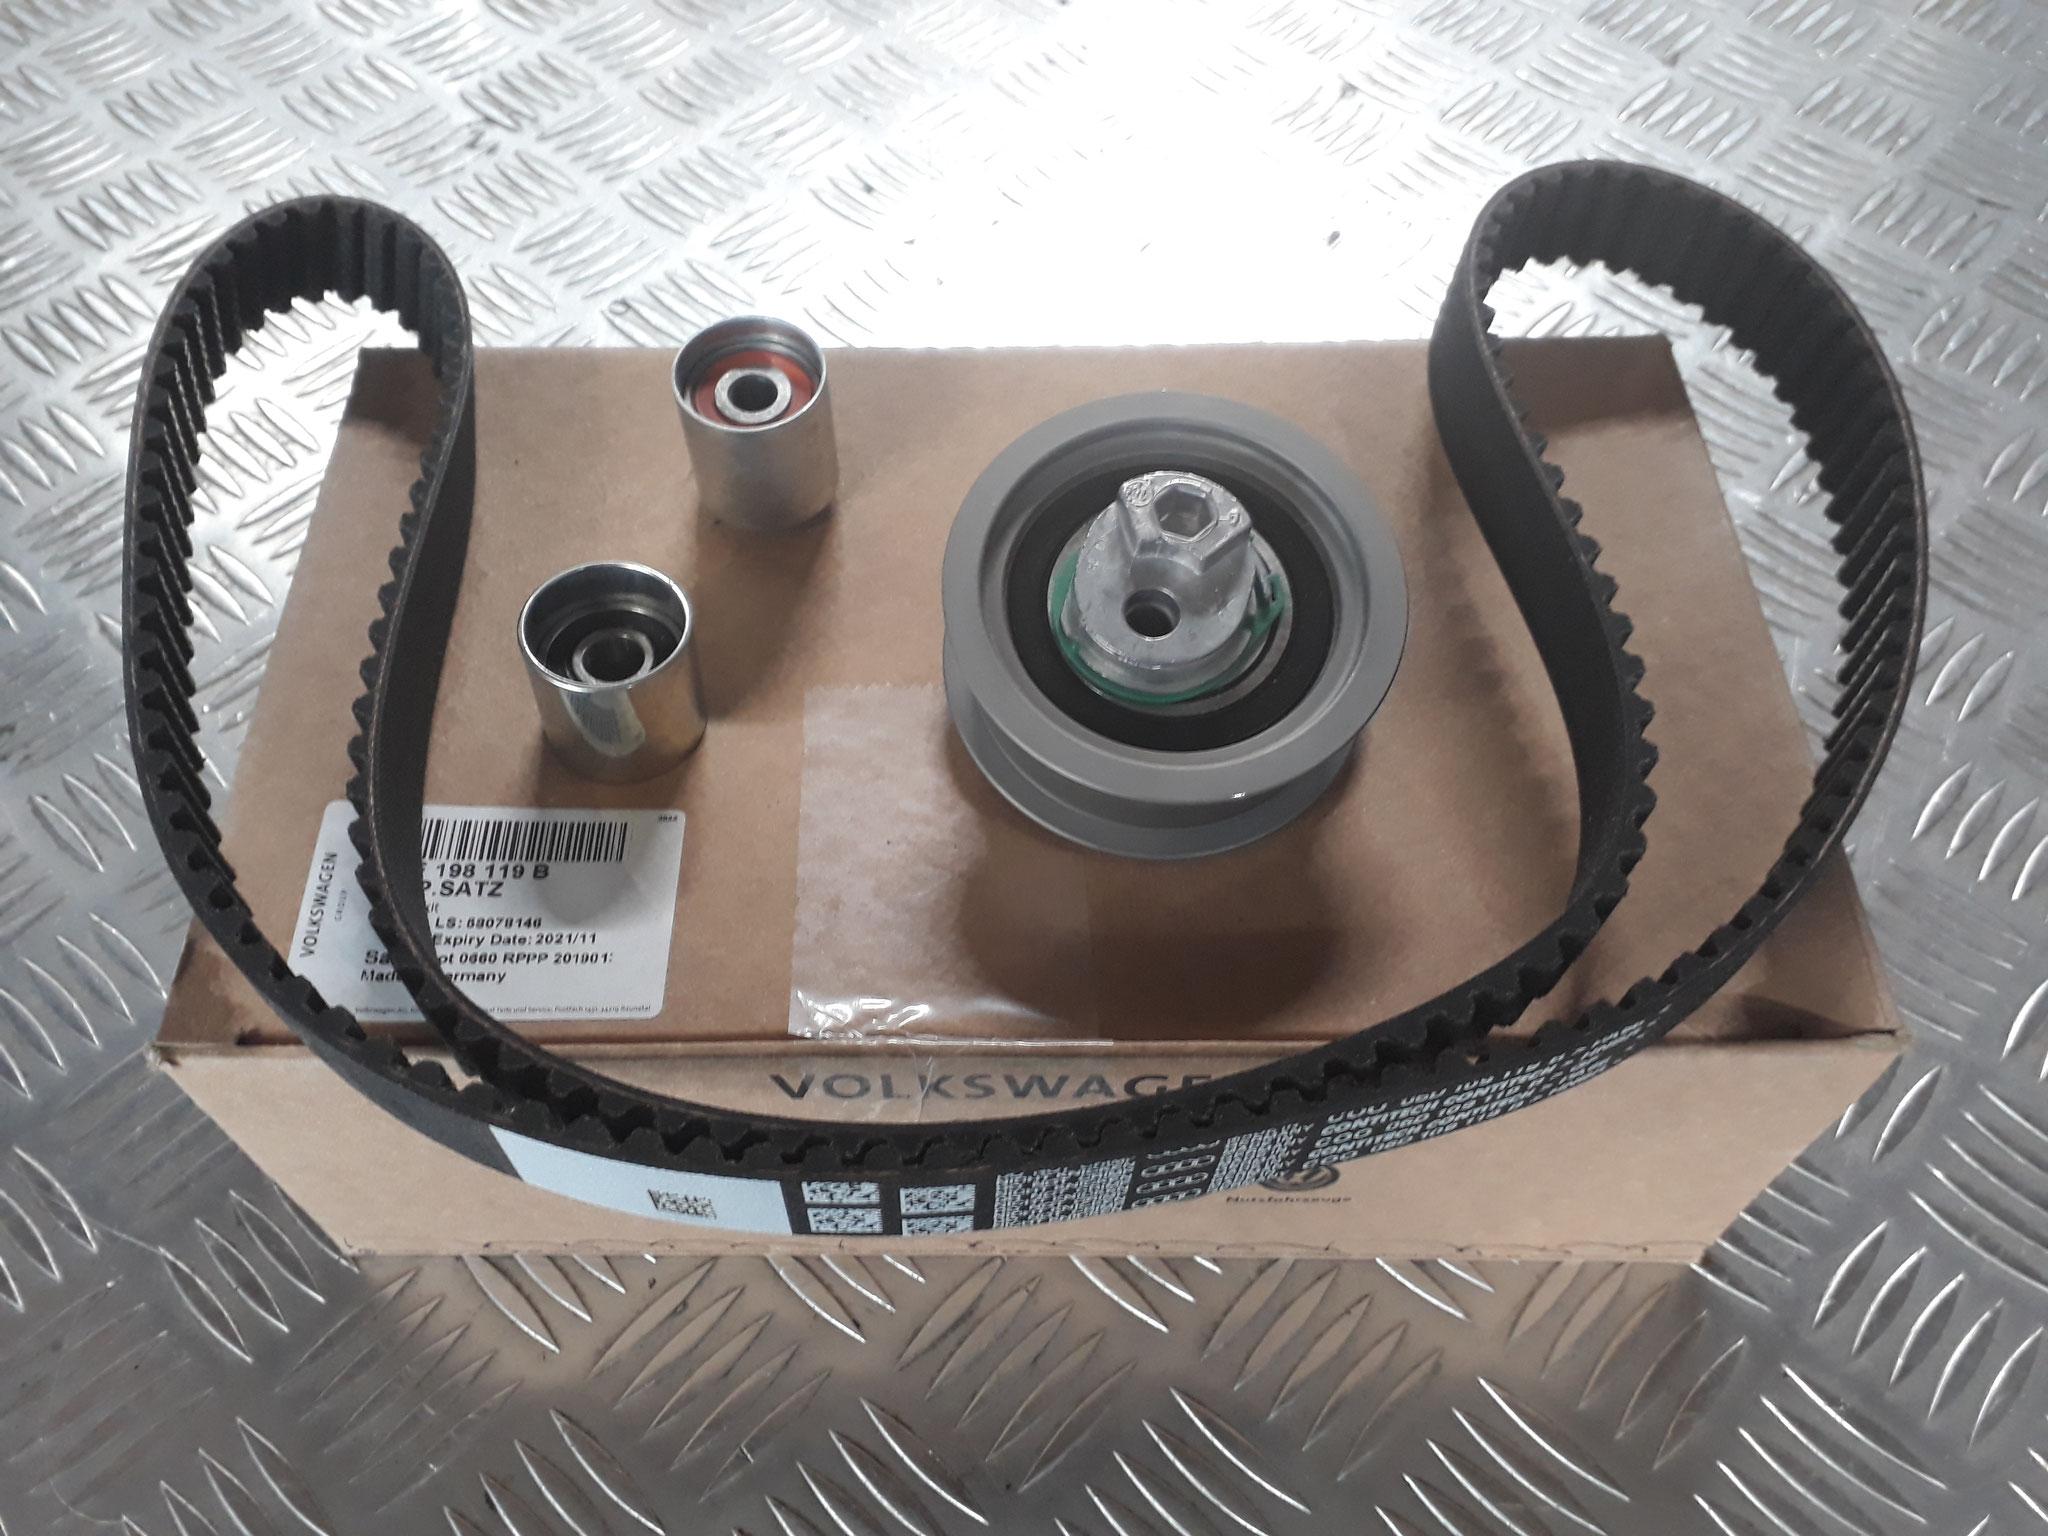 TSFI 16v Cambelt kit